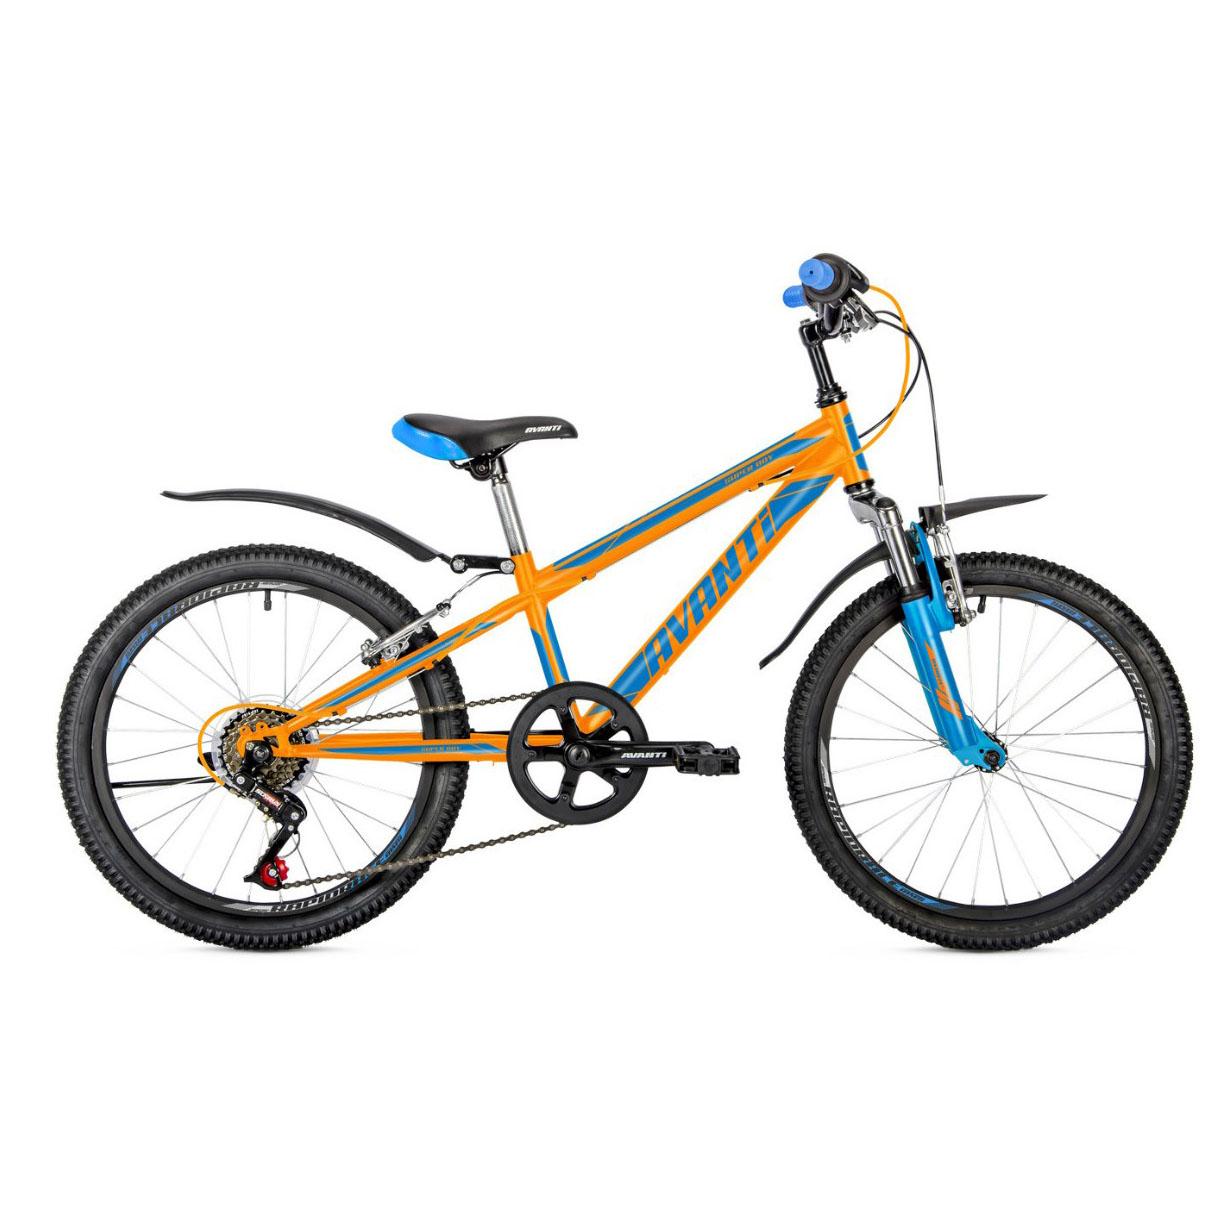 Фото Детский Велосипед 20 Avanti Super Boy 2018 оранжево-синий